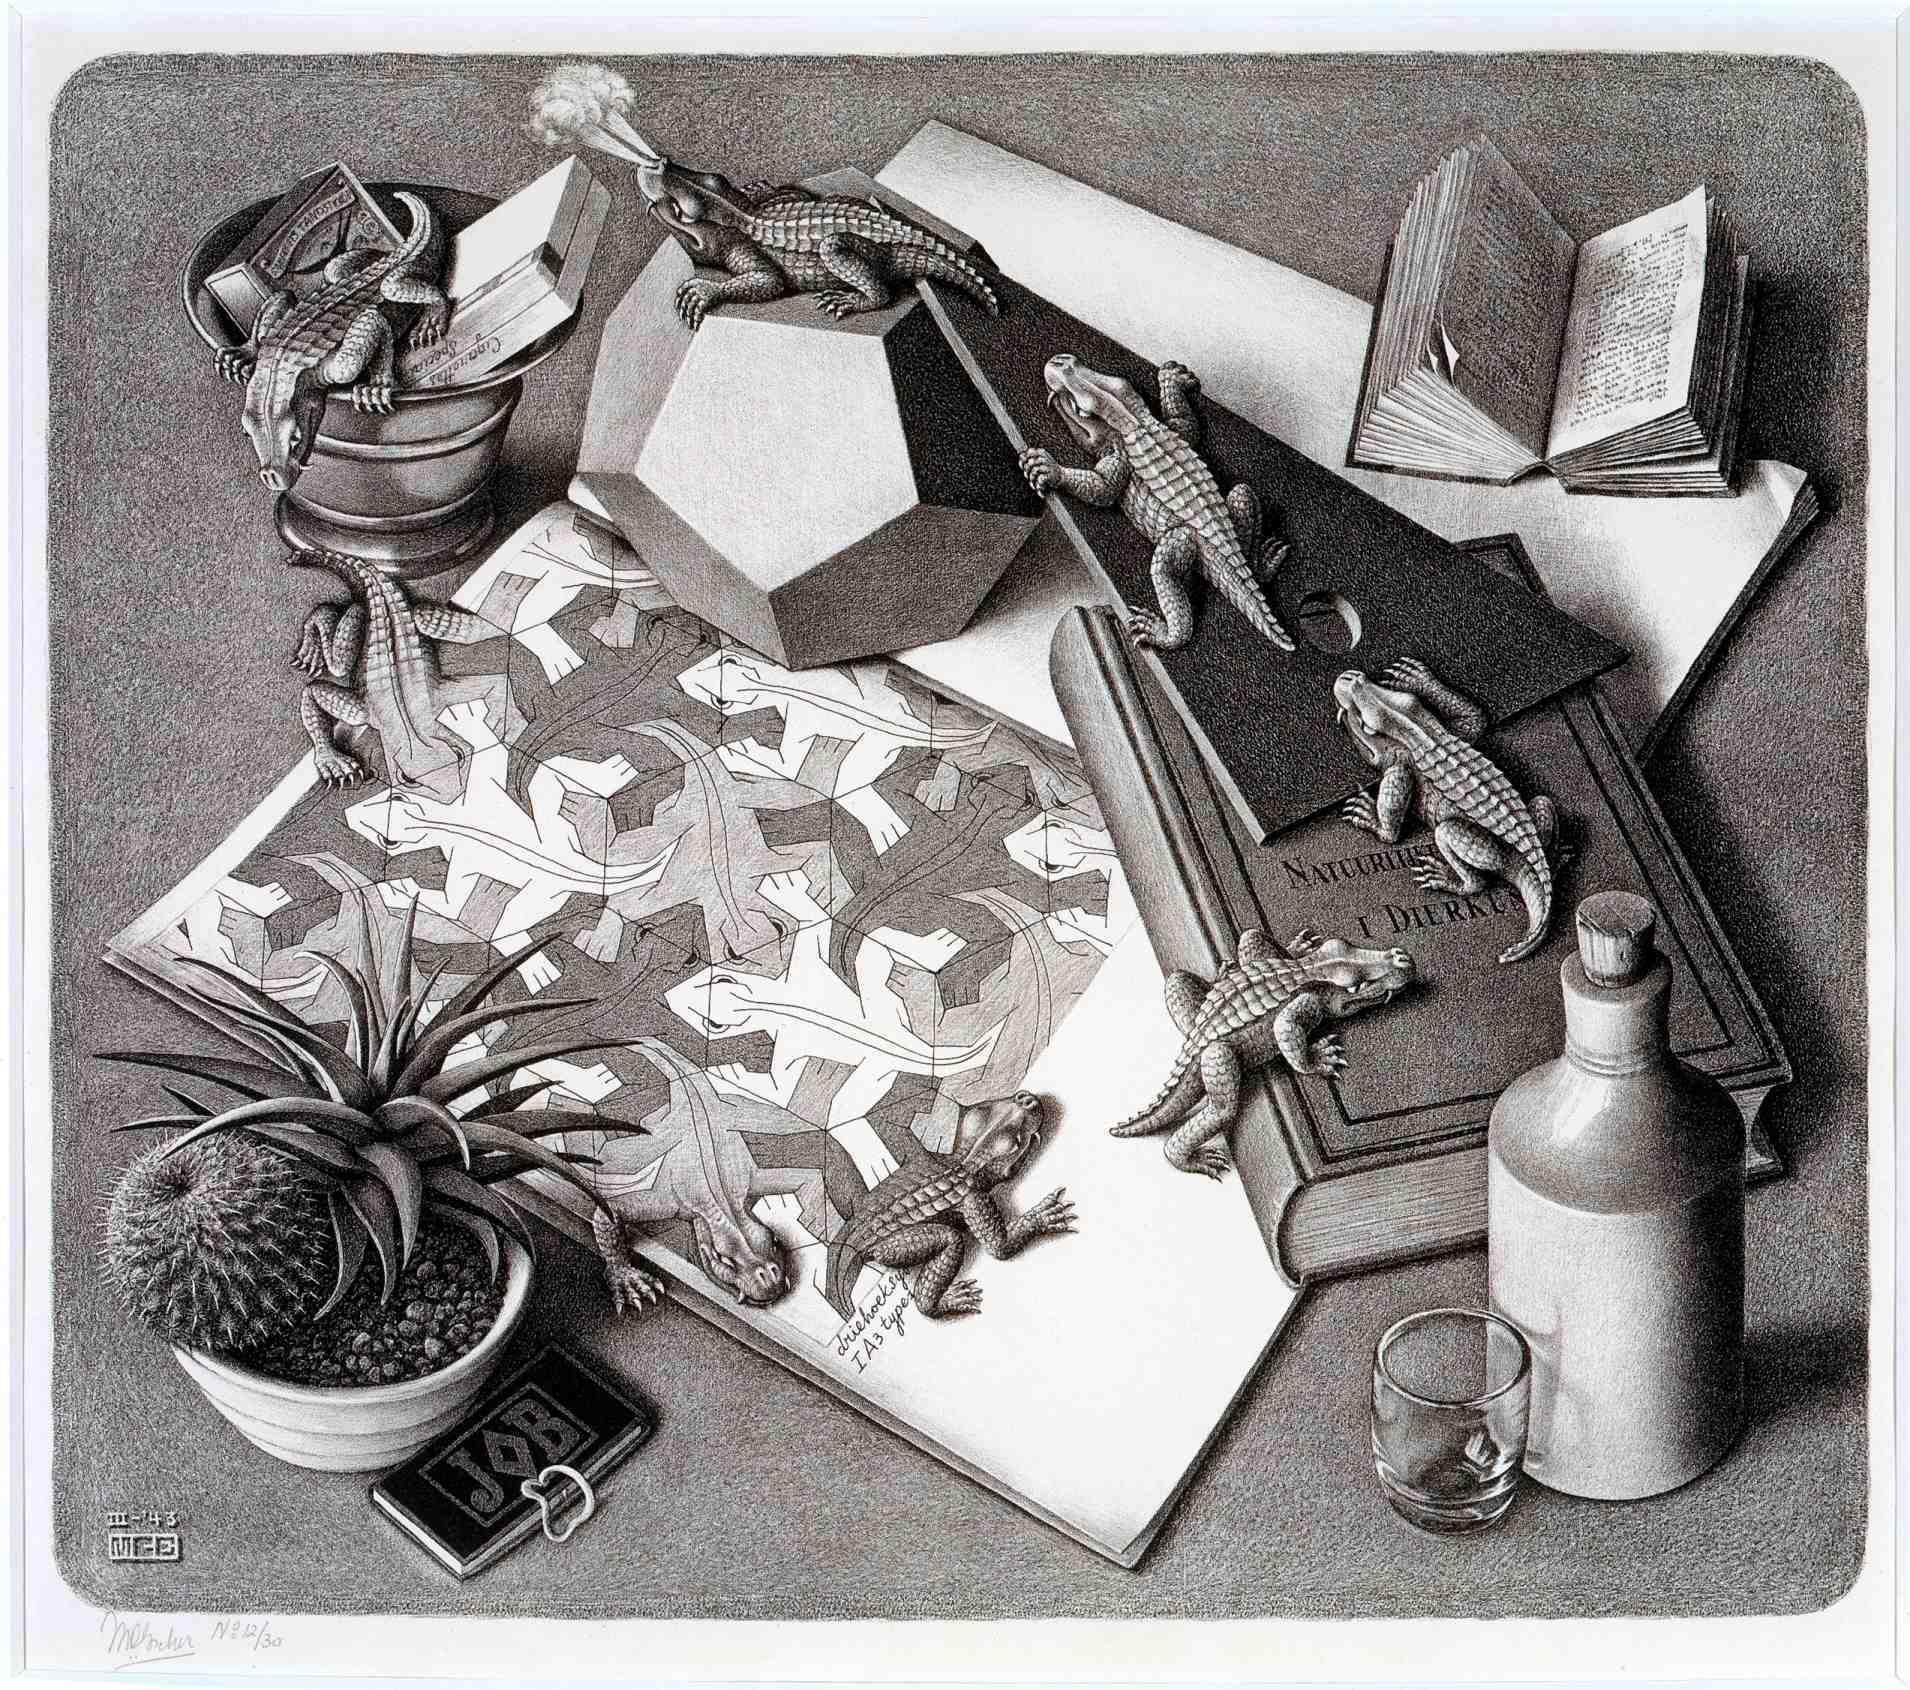 M.C. ESCHER (Dutch, 1898-1972), Reptiles, 1943, Bool #327, lithograph, 13 1/8 x 15 1/8 inches.